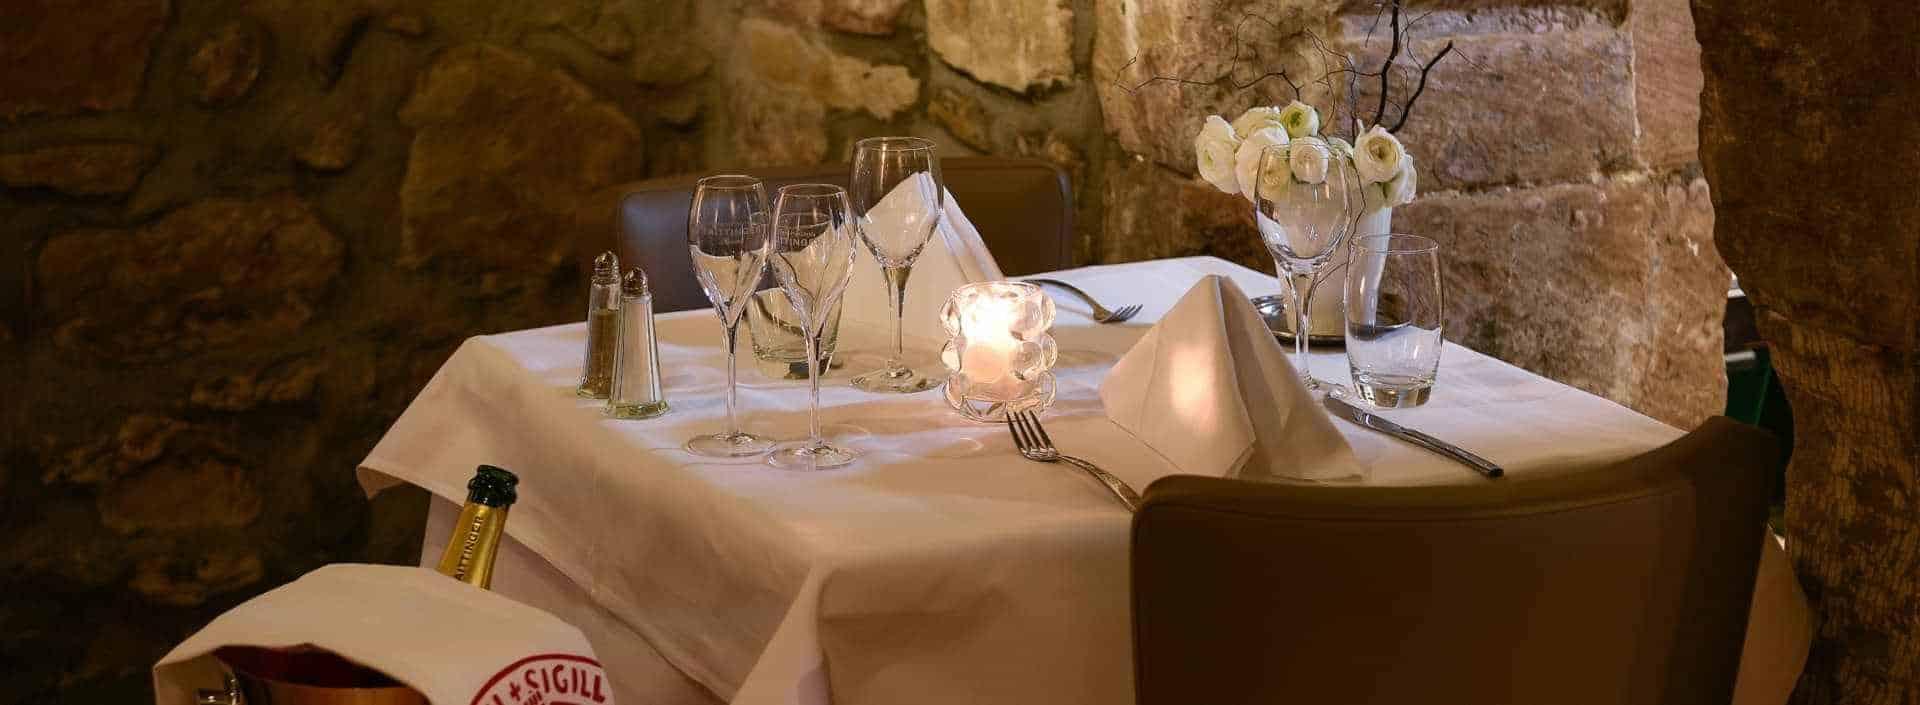 Restaurant l'Auberge in Chambesy Restaurant l'Auberge in Chambesy Restaurant l'Auberge in Chambesy - Book Your Table at The Restaurant l'Auberge in Chambesy Switzerland